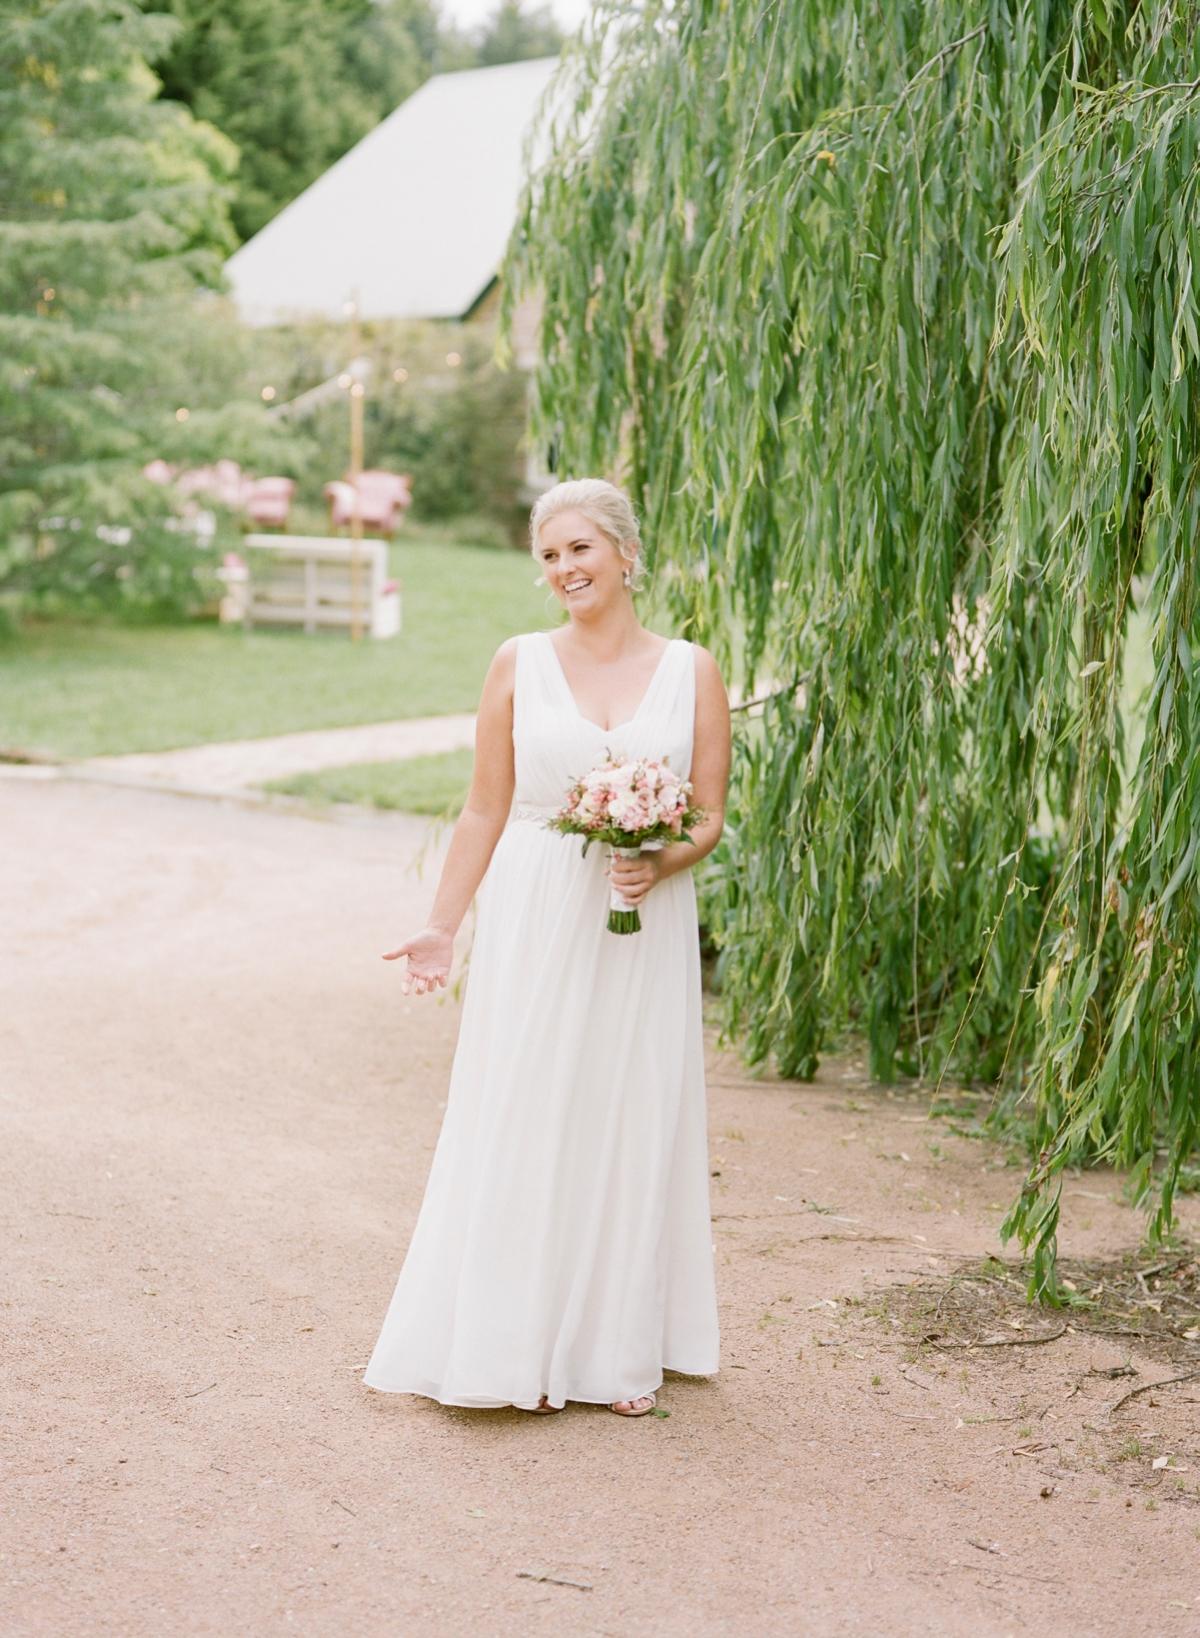 Monterose berry farm wedding by Mr Edwards Photography_0725.jpg